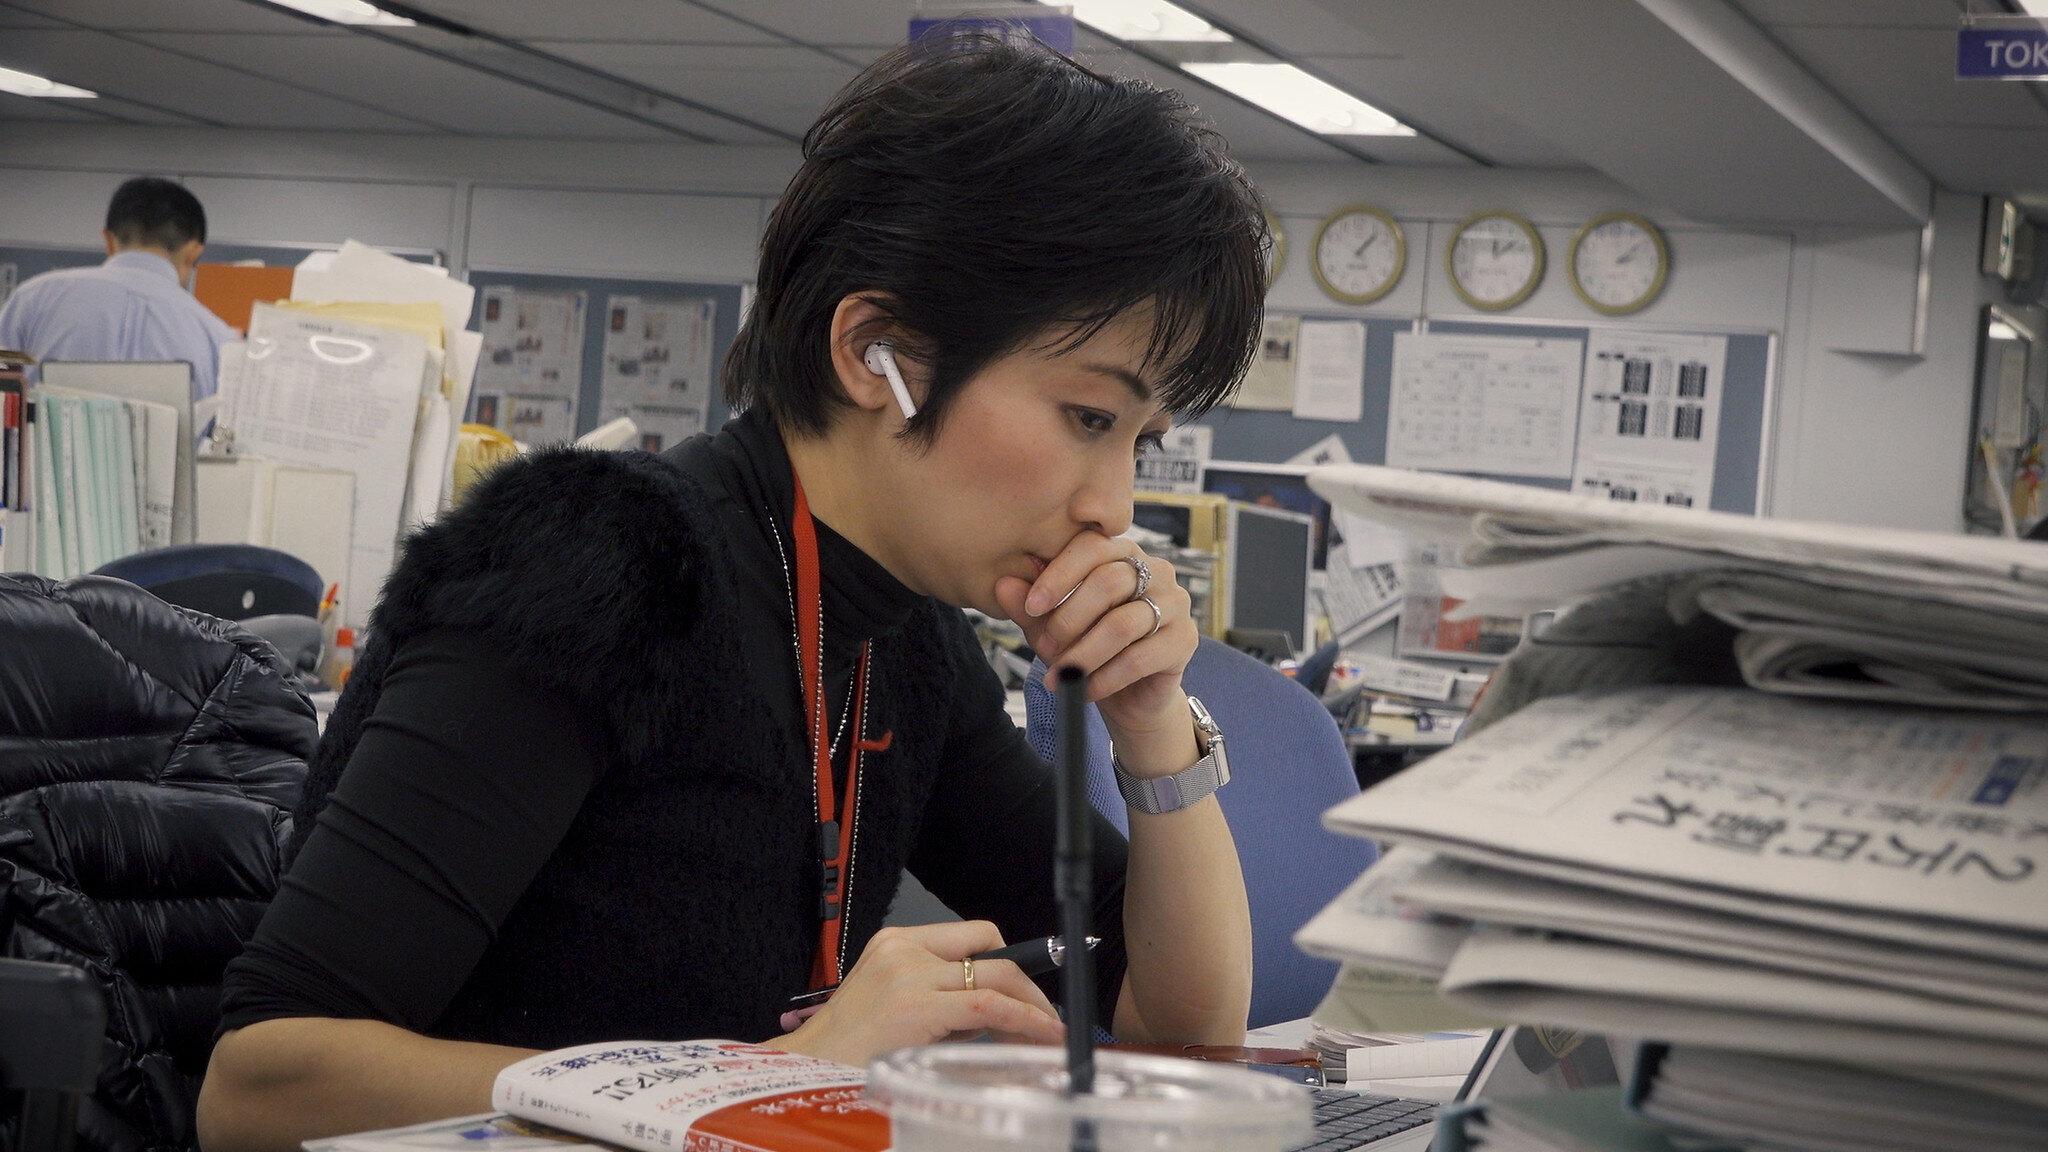 Isoko Mochizuki